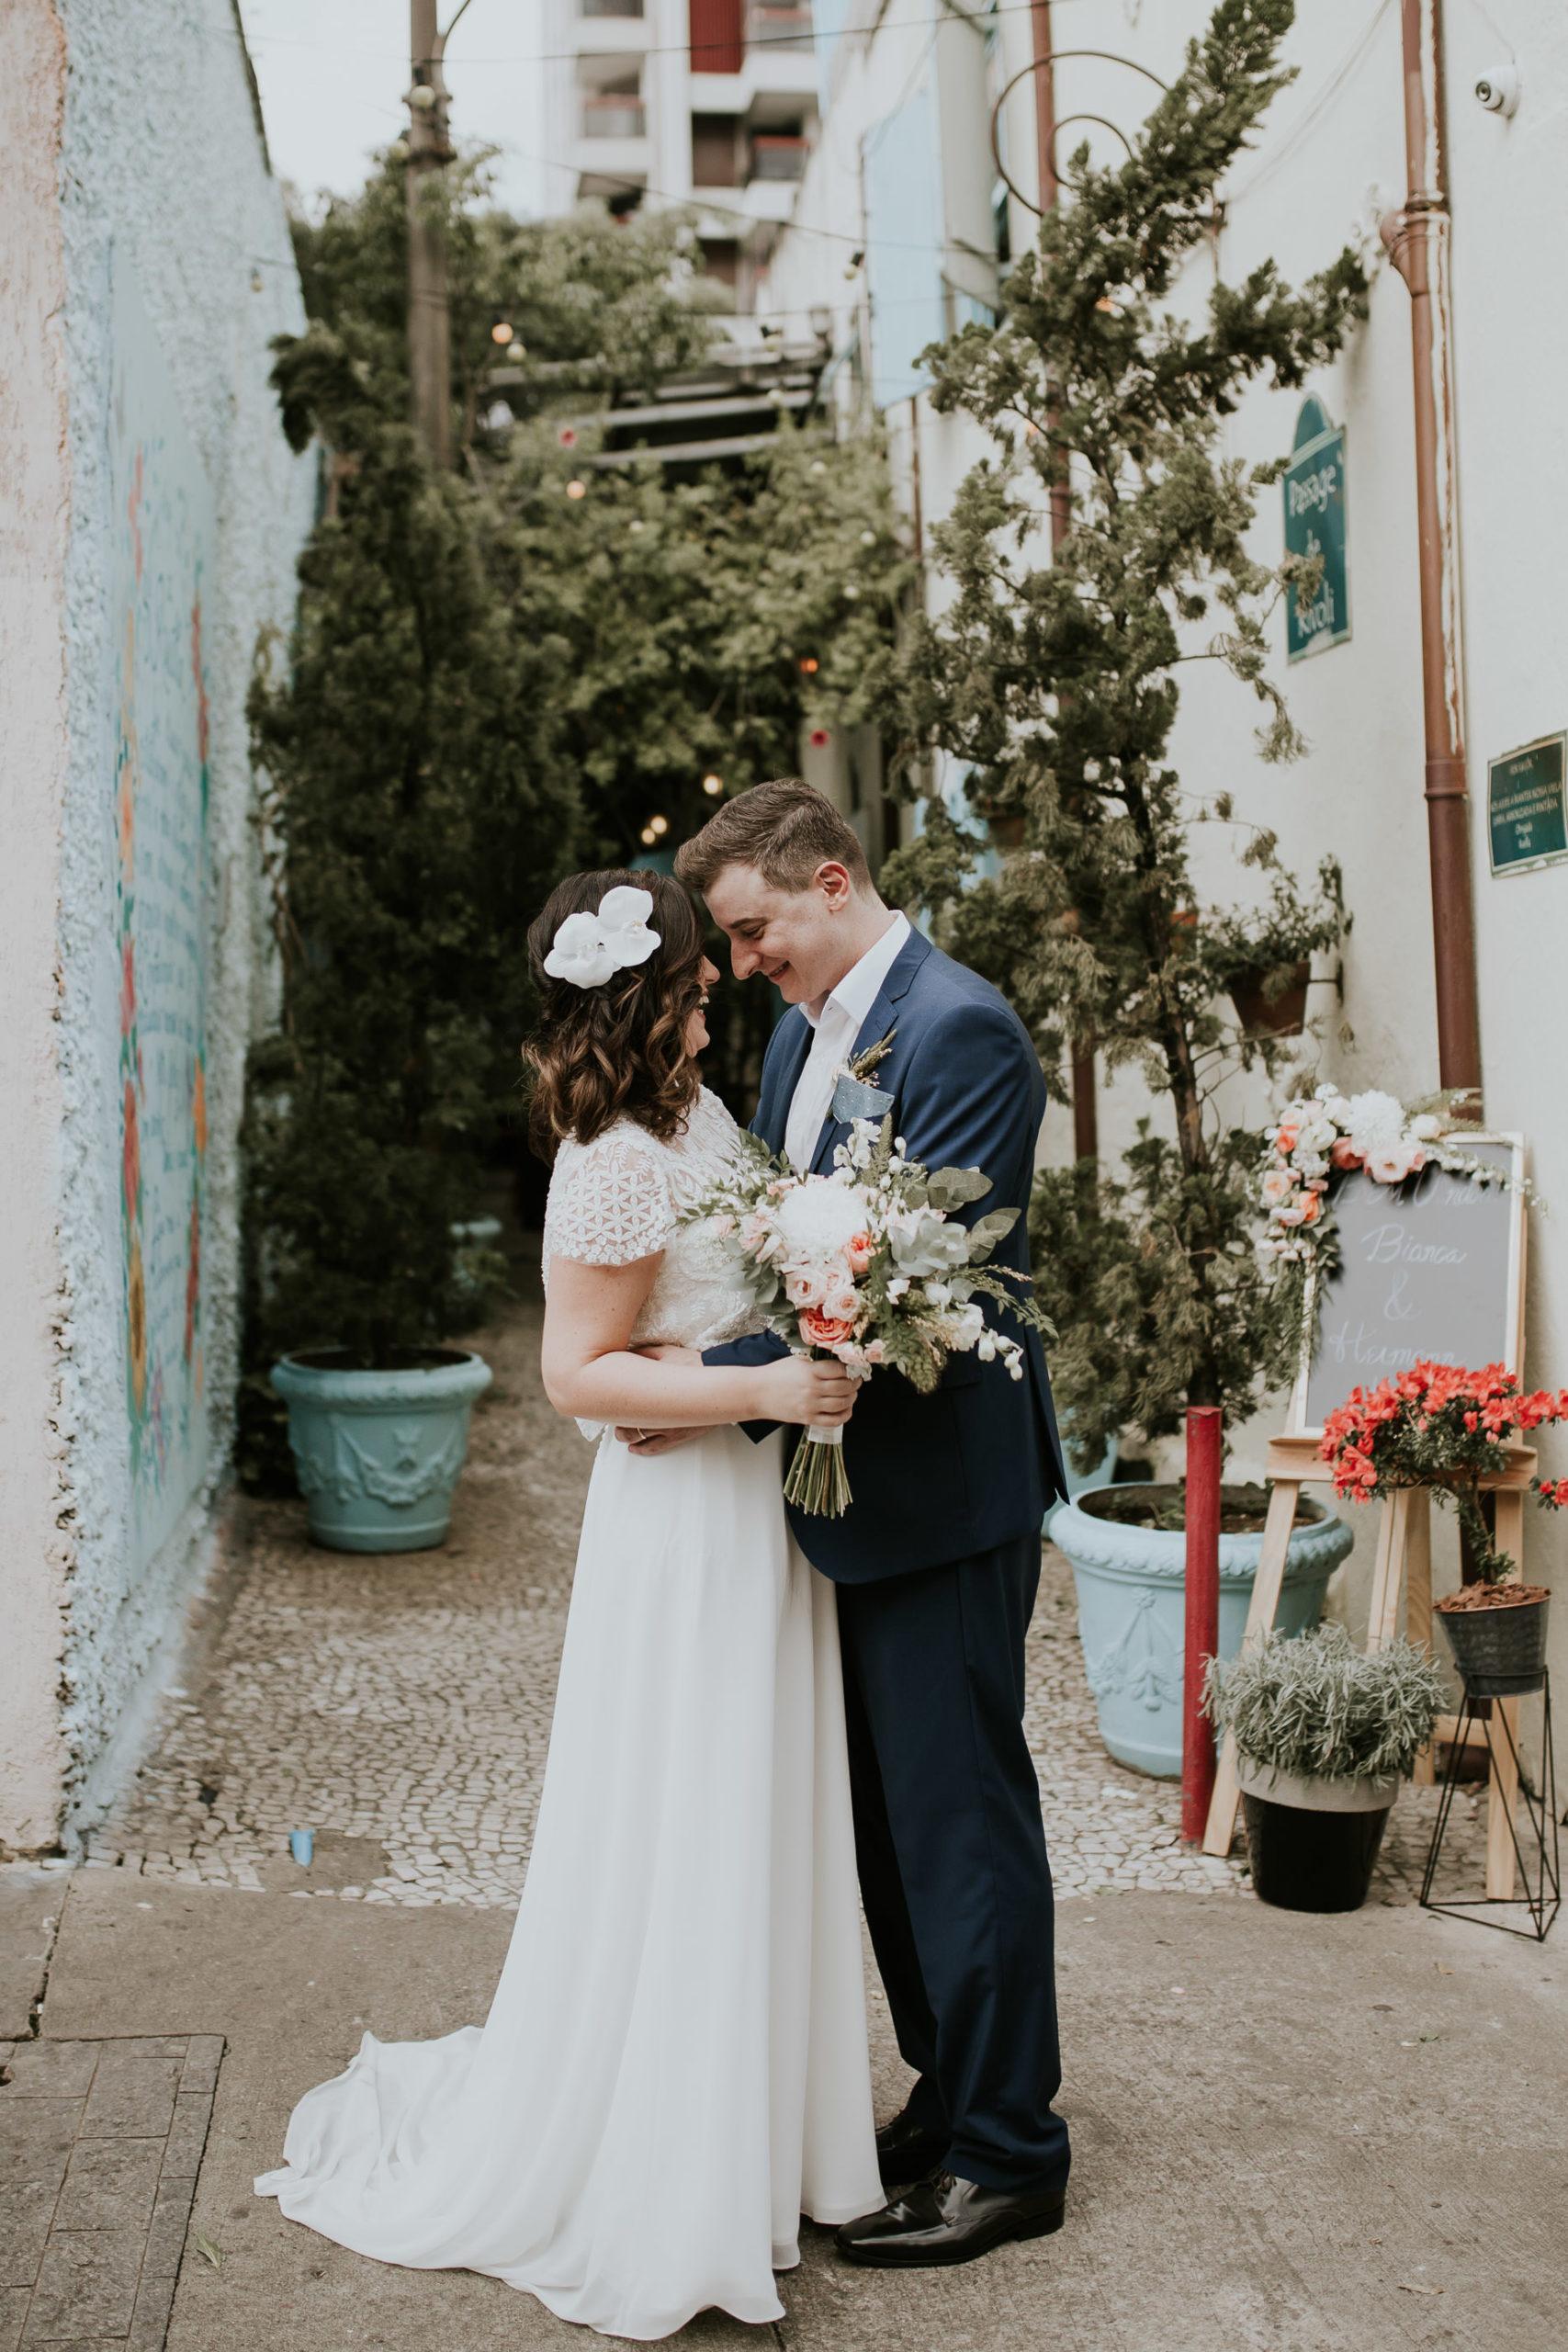 Karine Britto   Fotografia Minimalista   Casamentos Diurnos & Mini Weddings